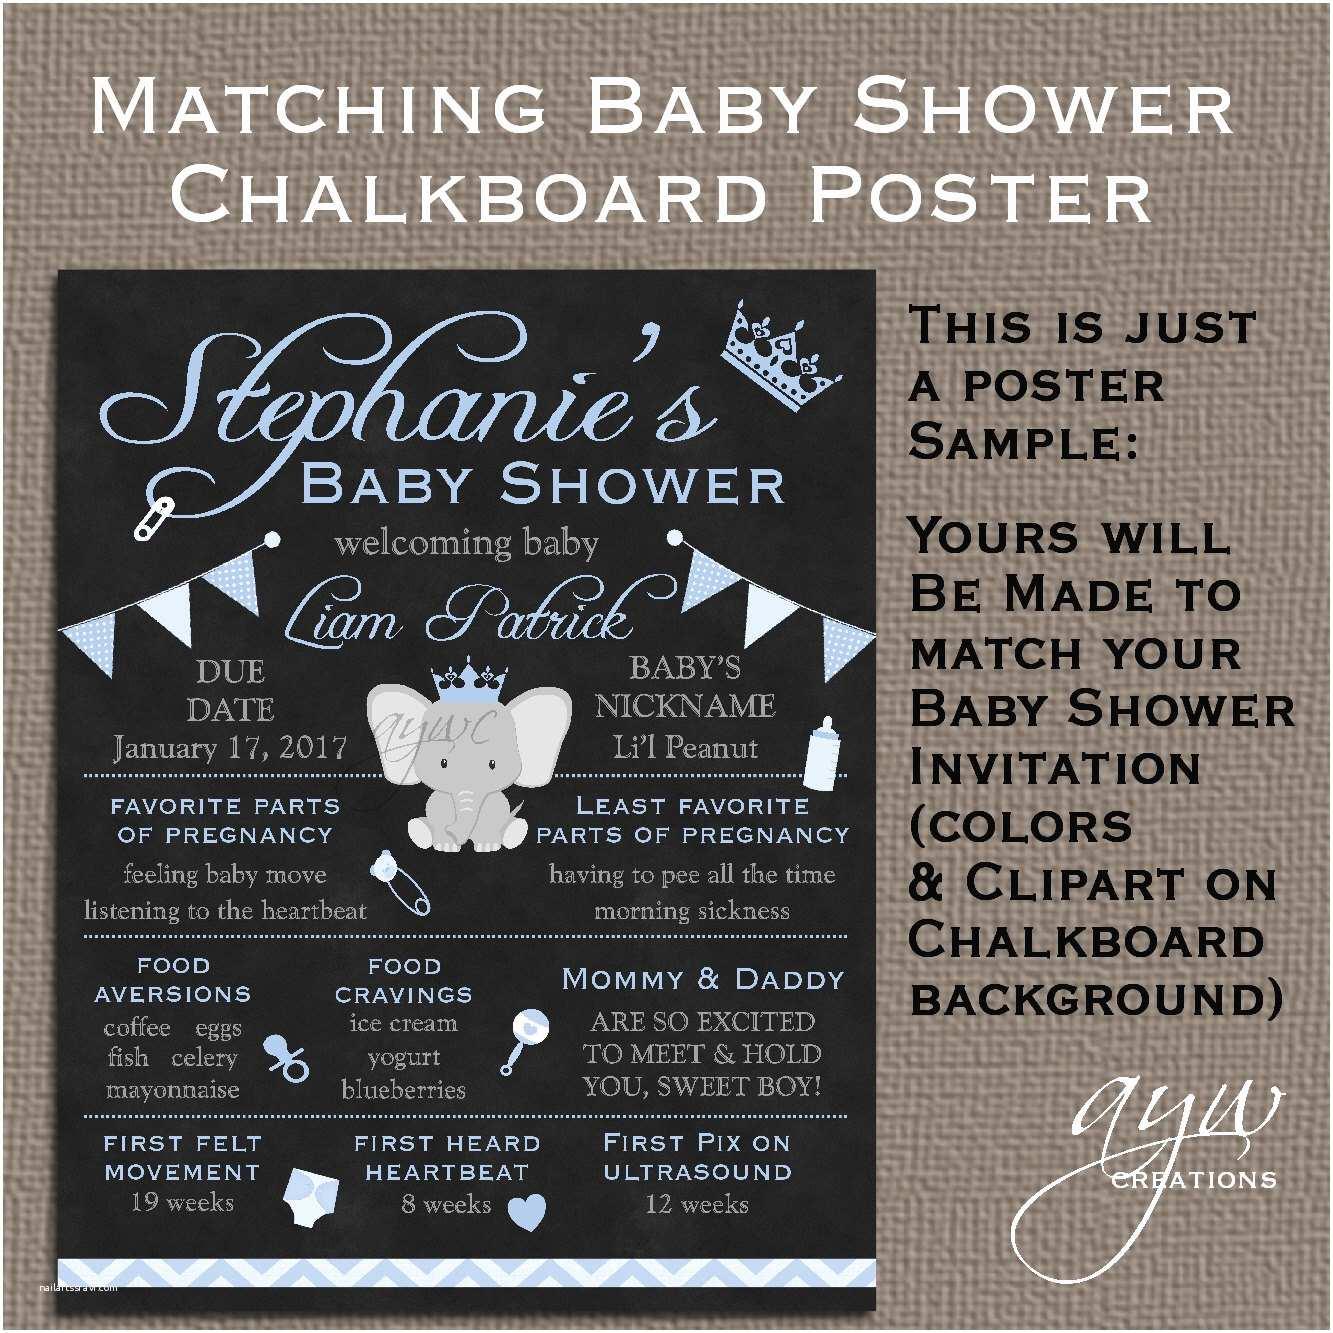 Chalkboard Baby Shower Invitations Baby Shower Chalkboard Poster Baby Shower Chalkboard Sign